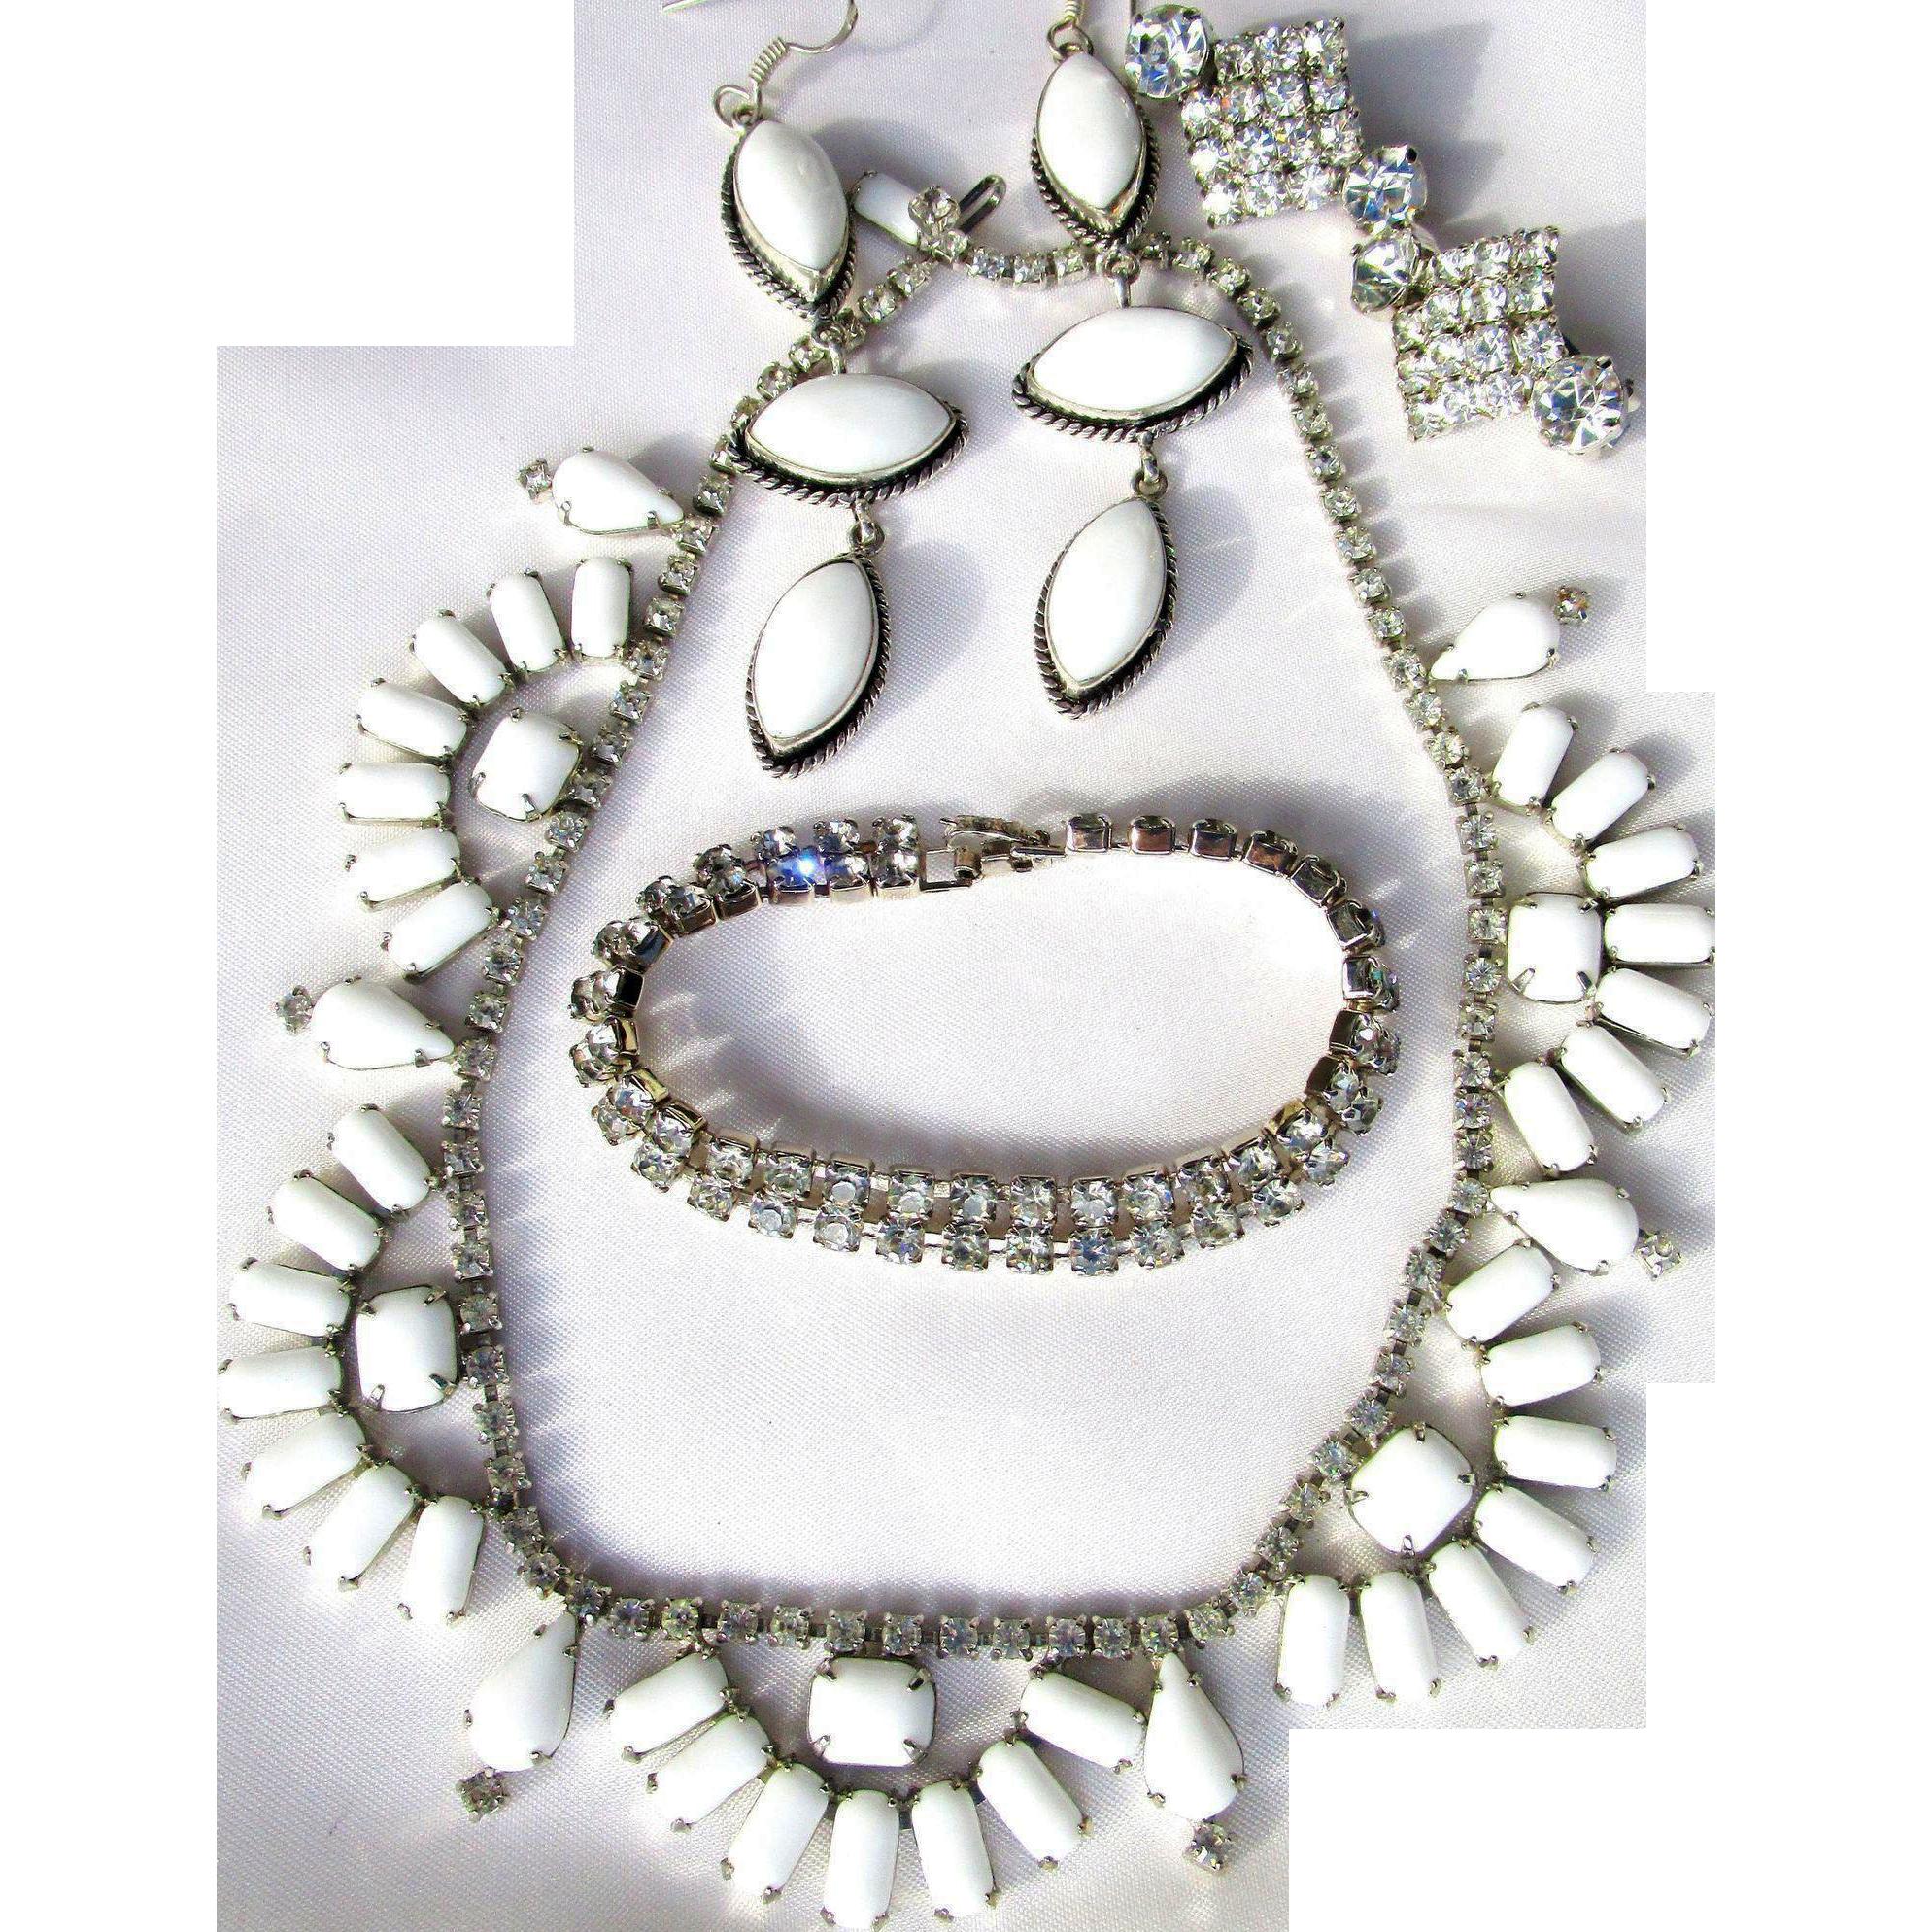 4 Pc. Vintage Kramer Baguette Shaped Milkglass Necklace and 2 pr. Agate/Crystal Earrings/Bracelet